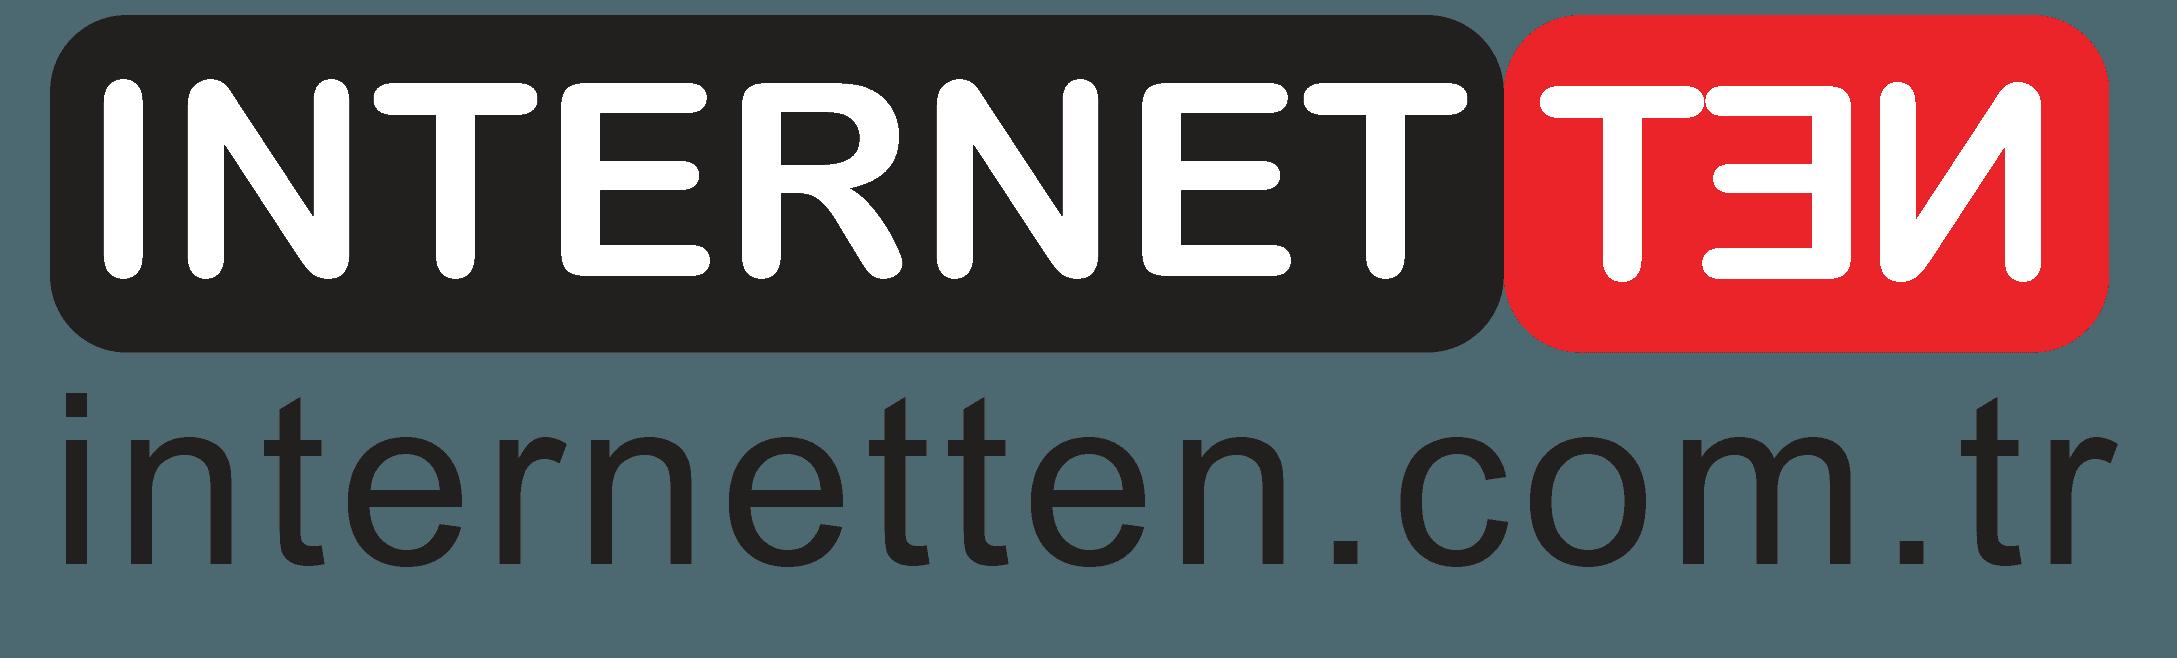 internetten.com.tr